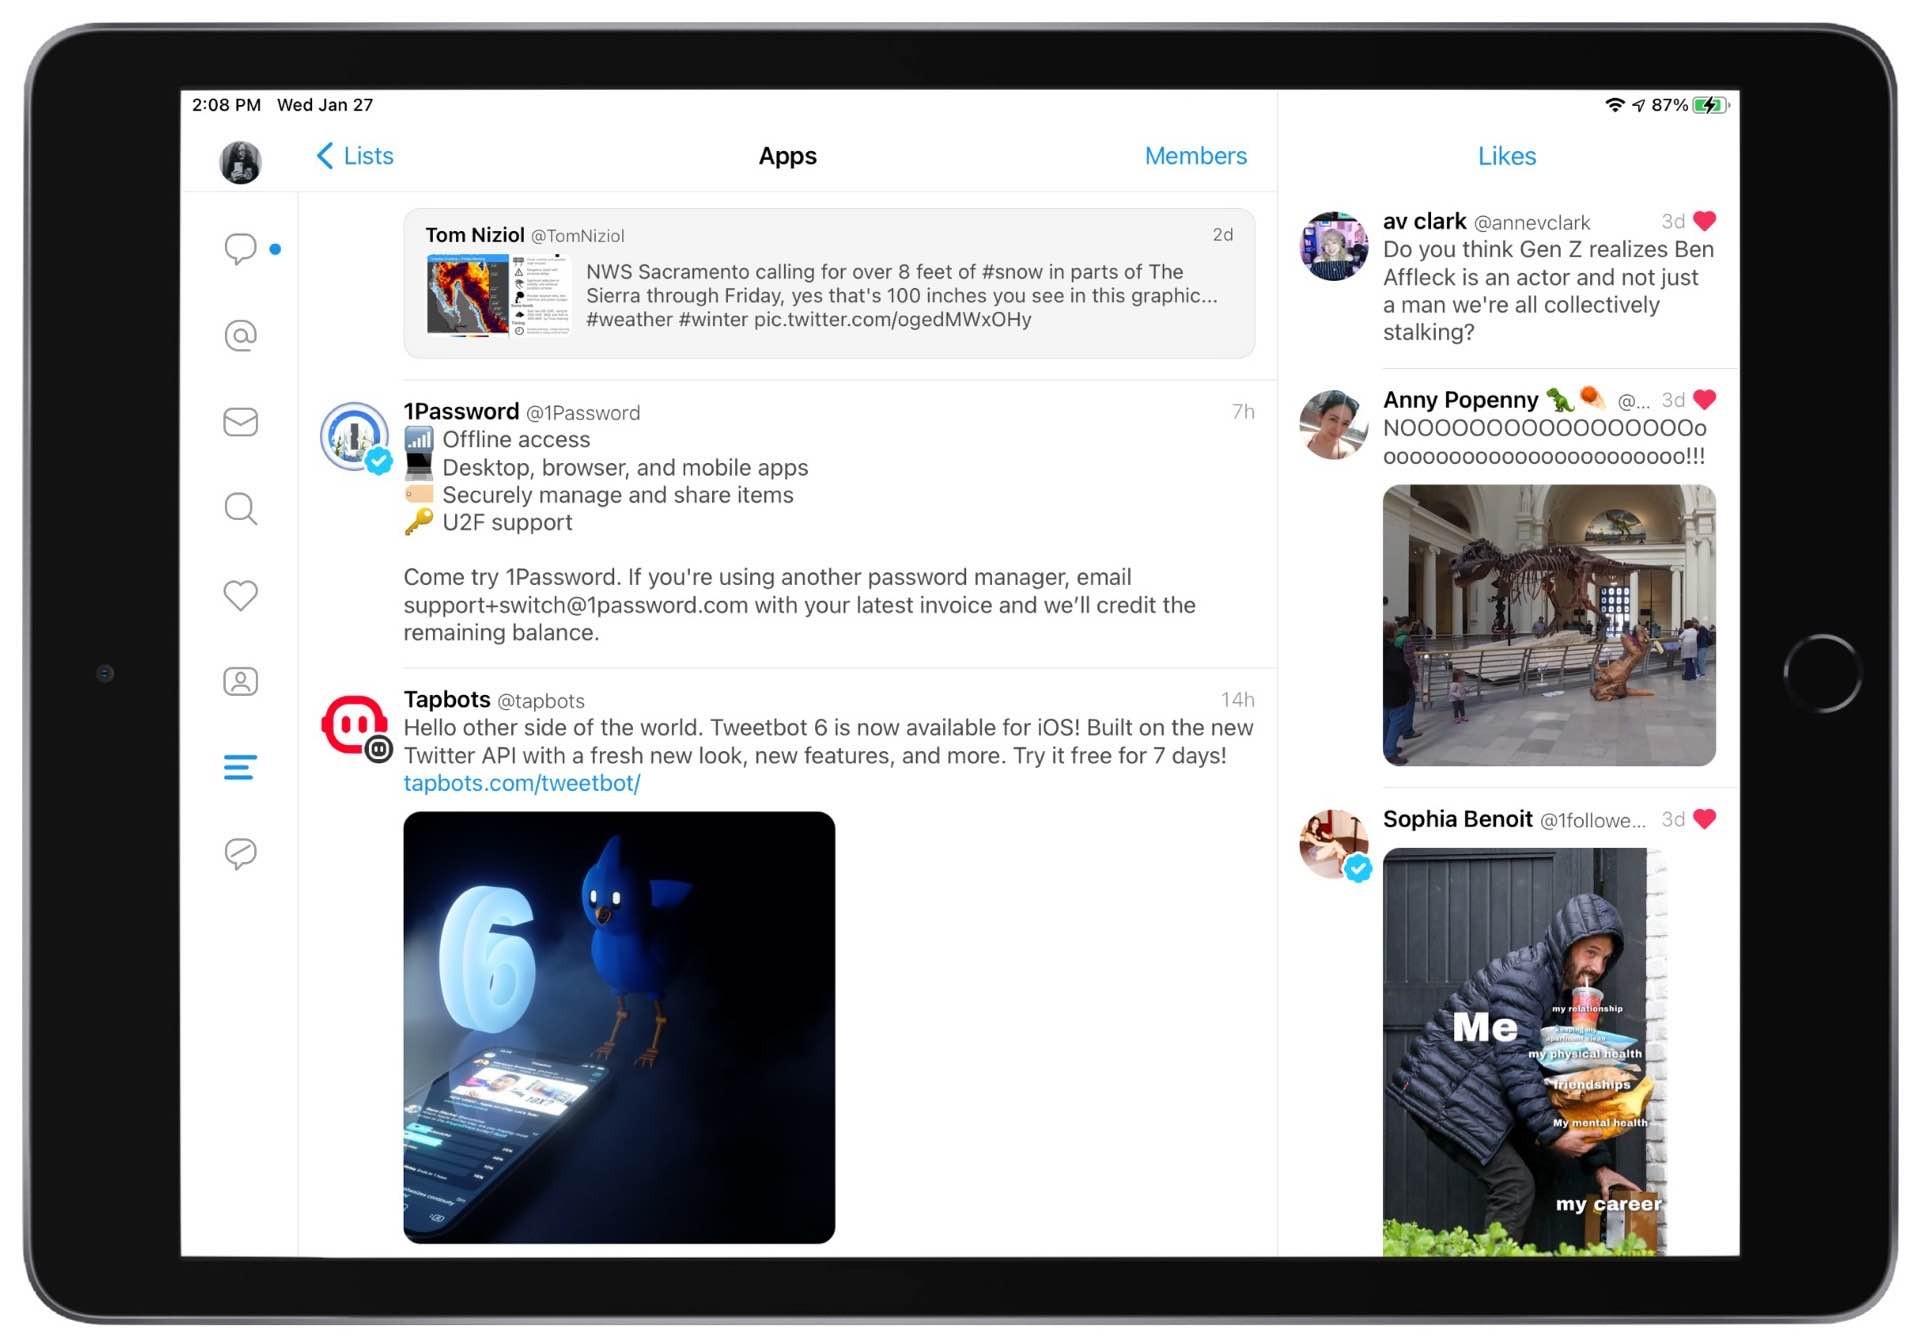 tweetbot-6-ipad-light